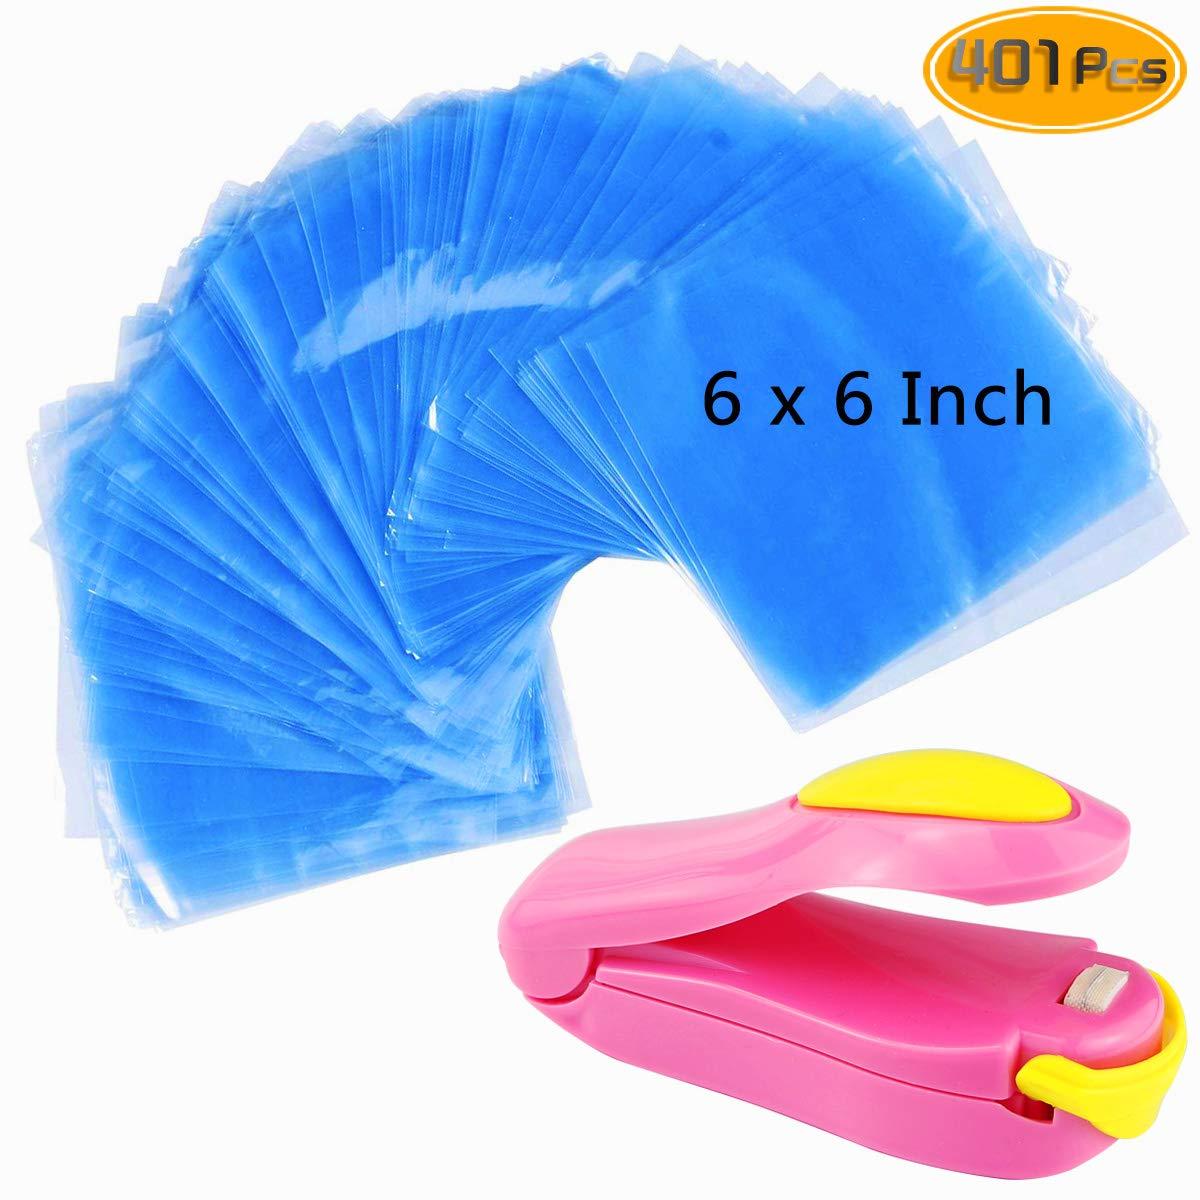 Kuqqi 400 pcs 6 x 6 inch Shrink Wrap Bags Bath Bombs and DIY Crafts Bonus Mini Heat Sealer Bags for Handmade Soaps